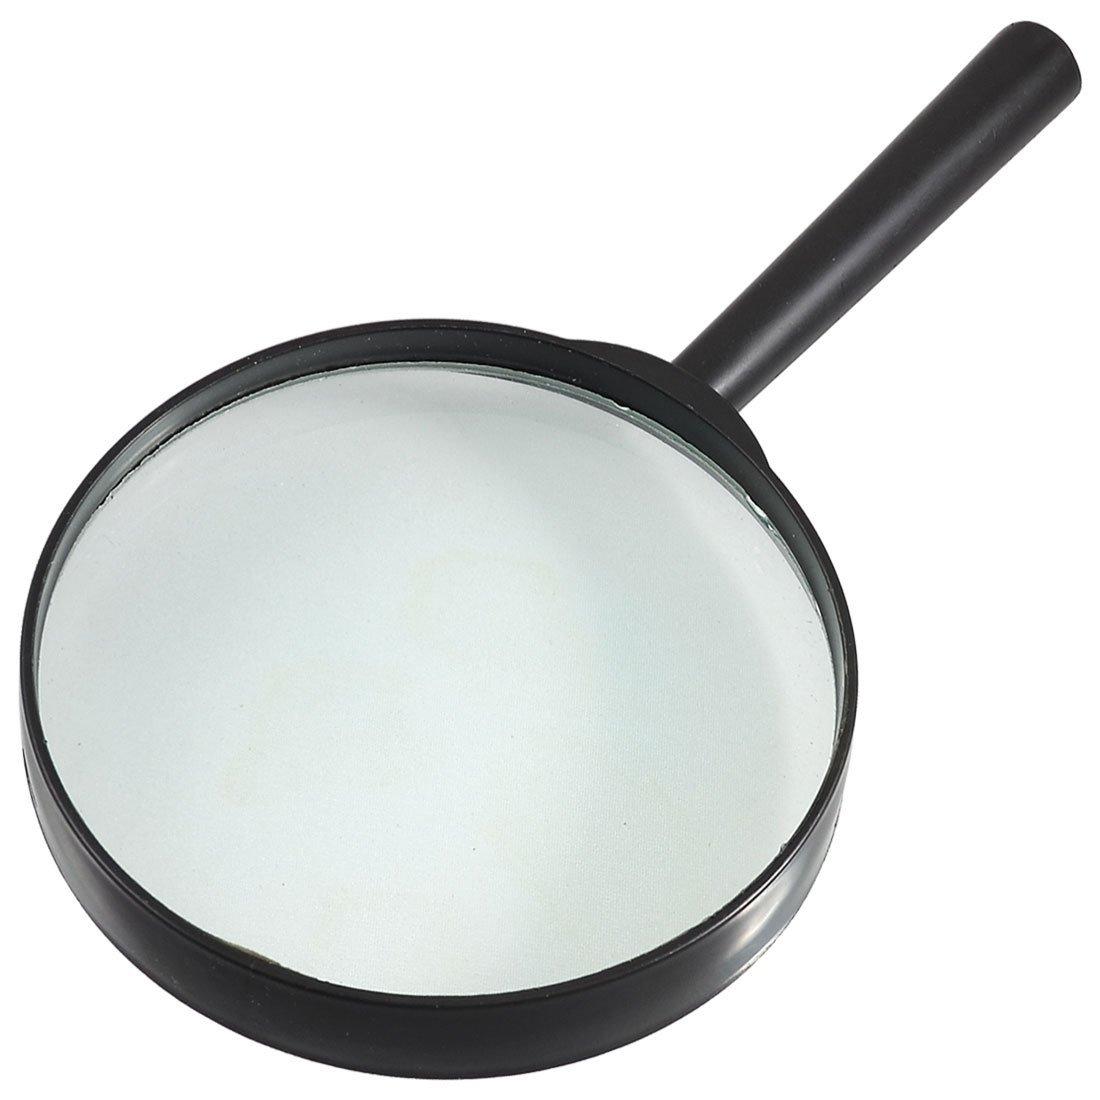 Cikuso Plastica nero rotondo manico 90 millimetri Dia Loupe 5X lente dingrandimento